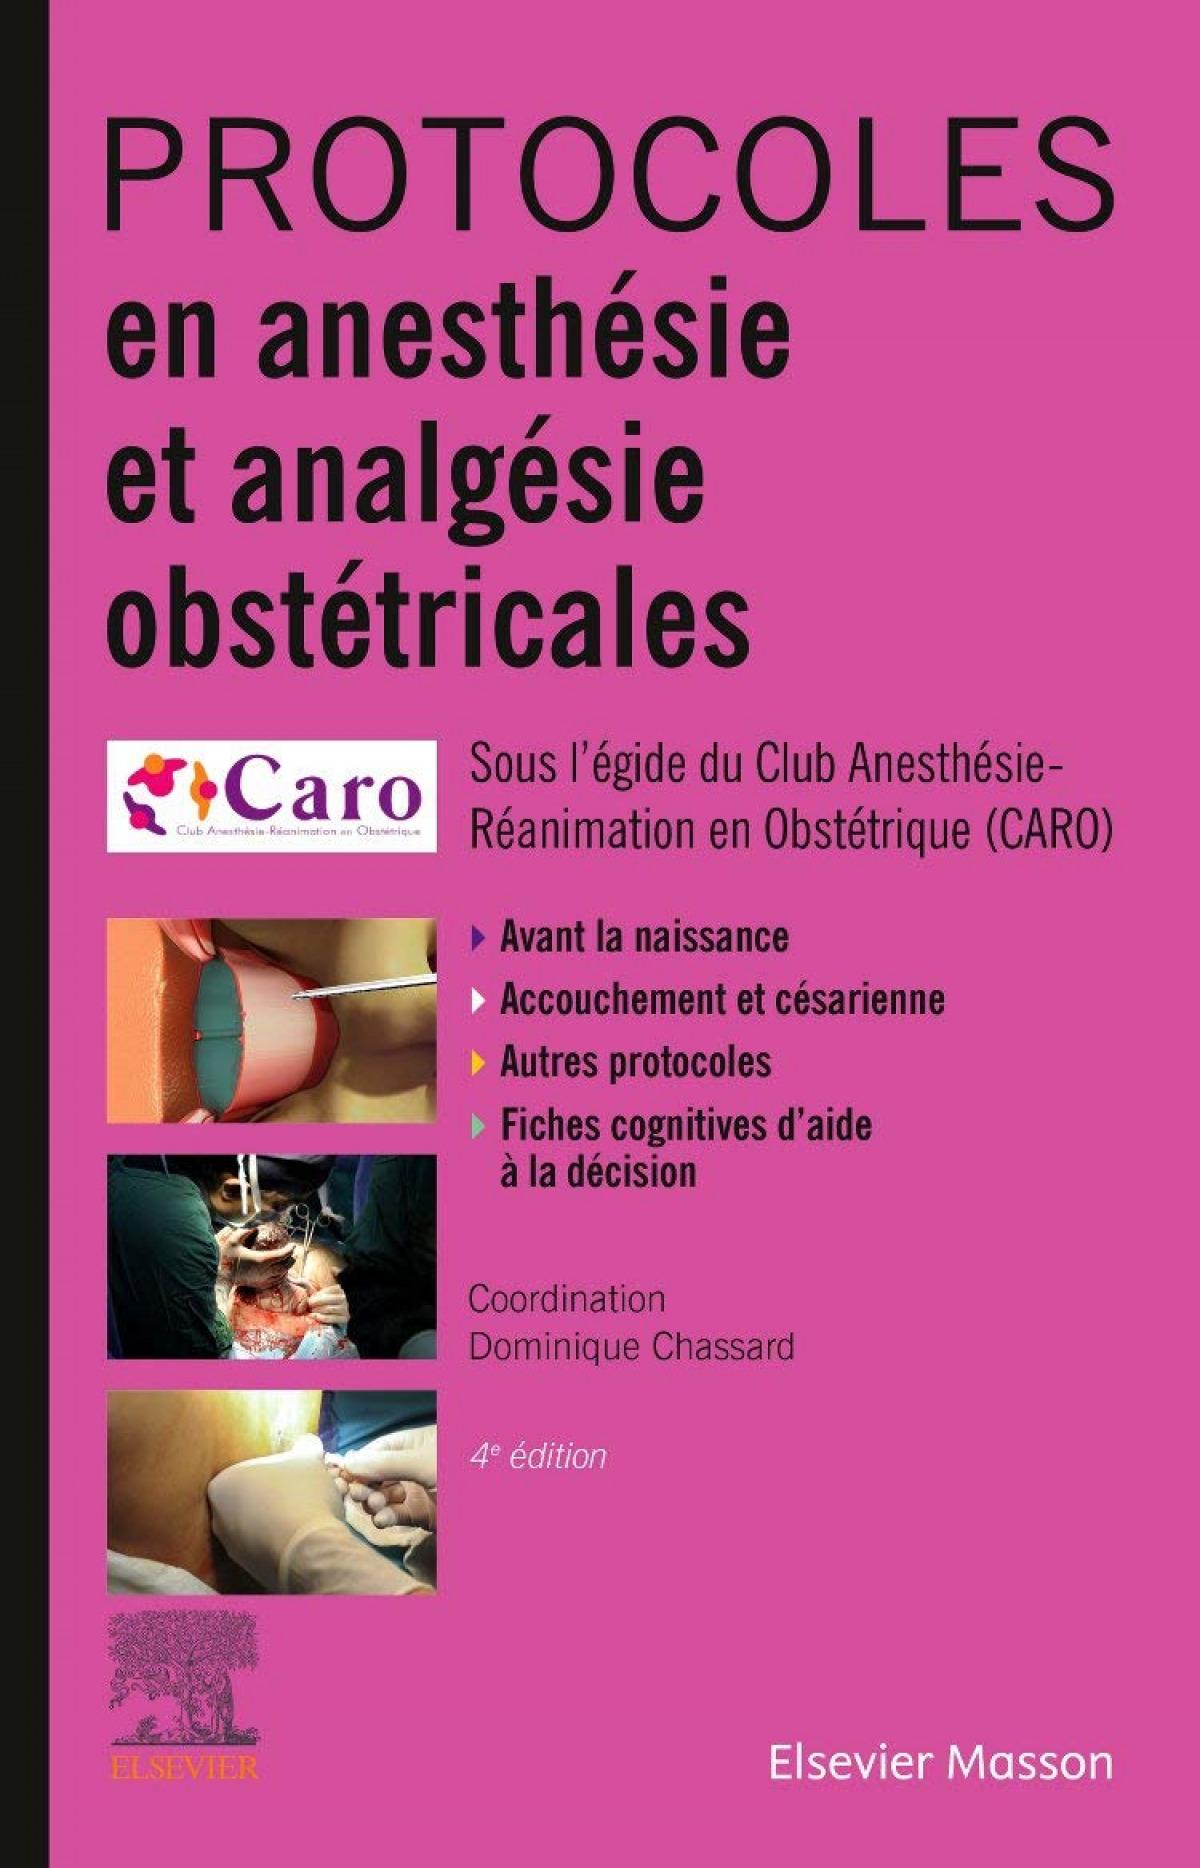 protocoles en anesthesie et analgesie obstetriciales